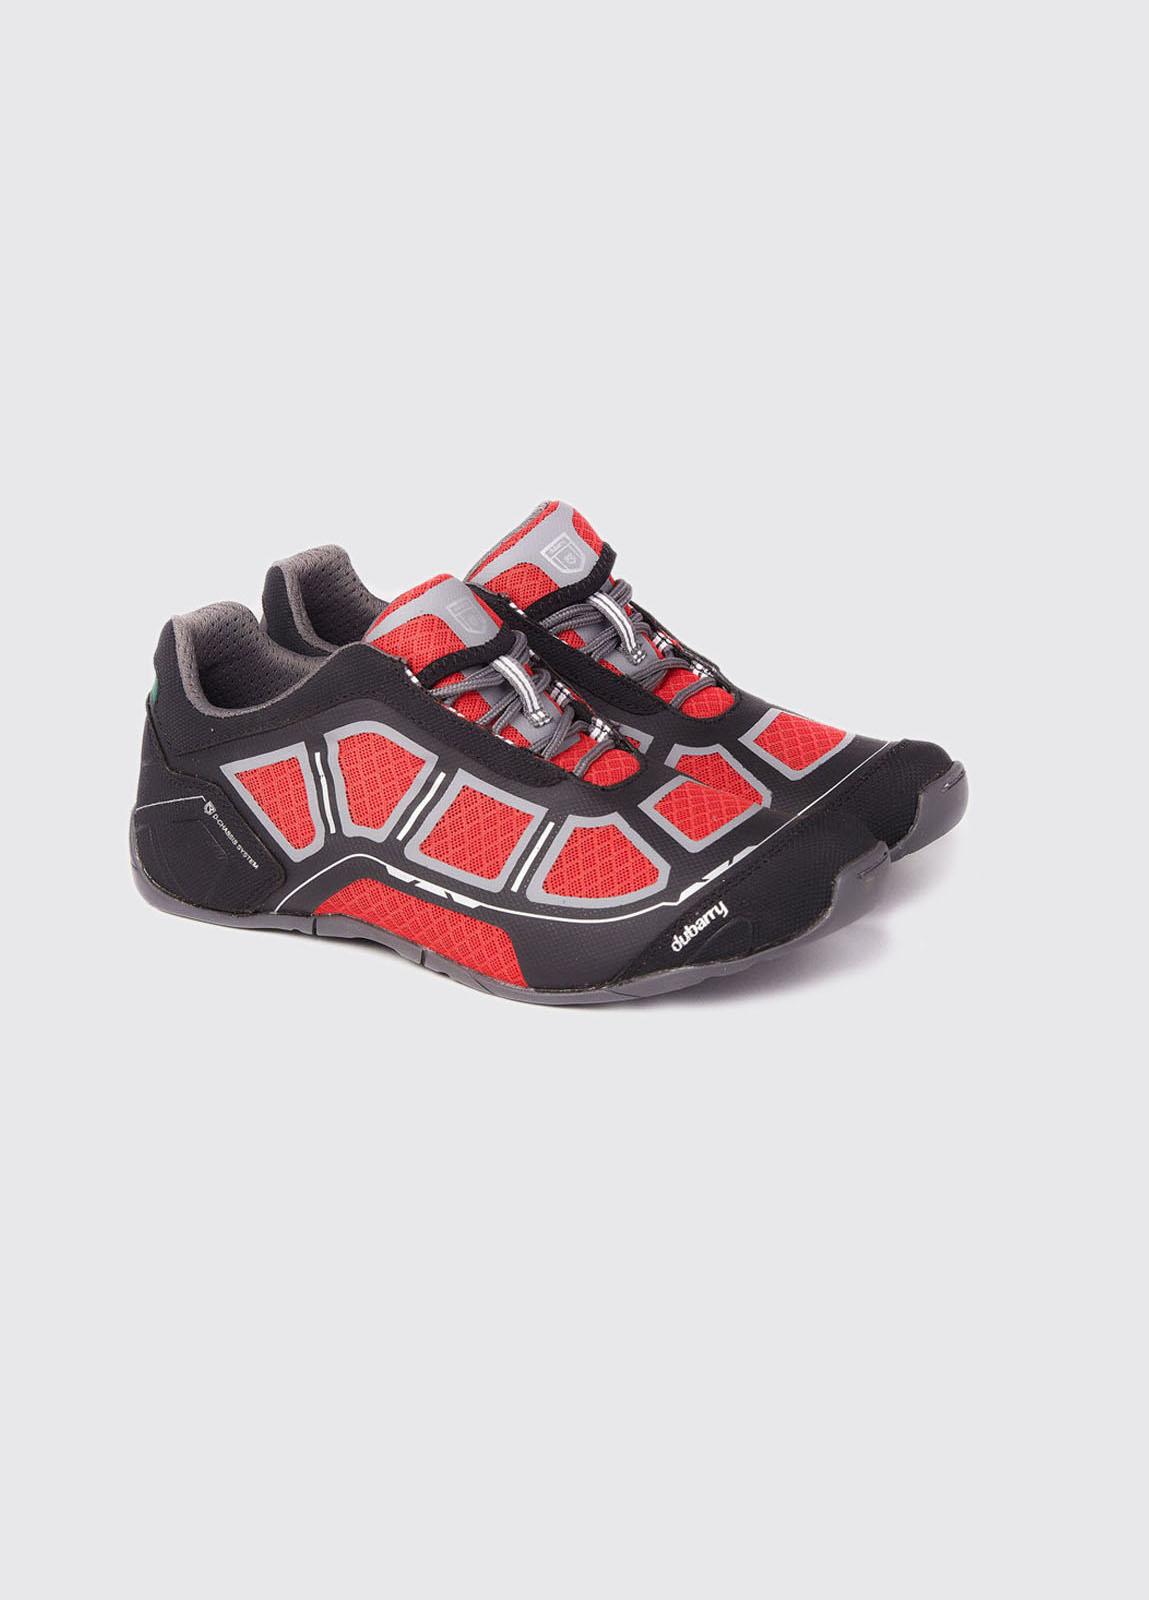 Easkey Sailing Shoe - Red Multi